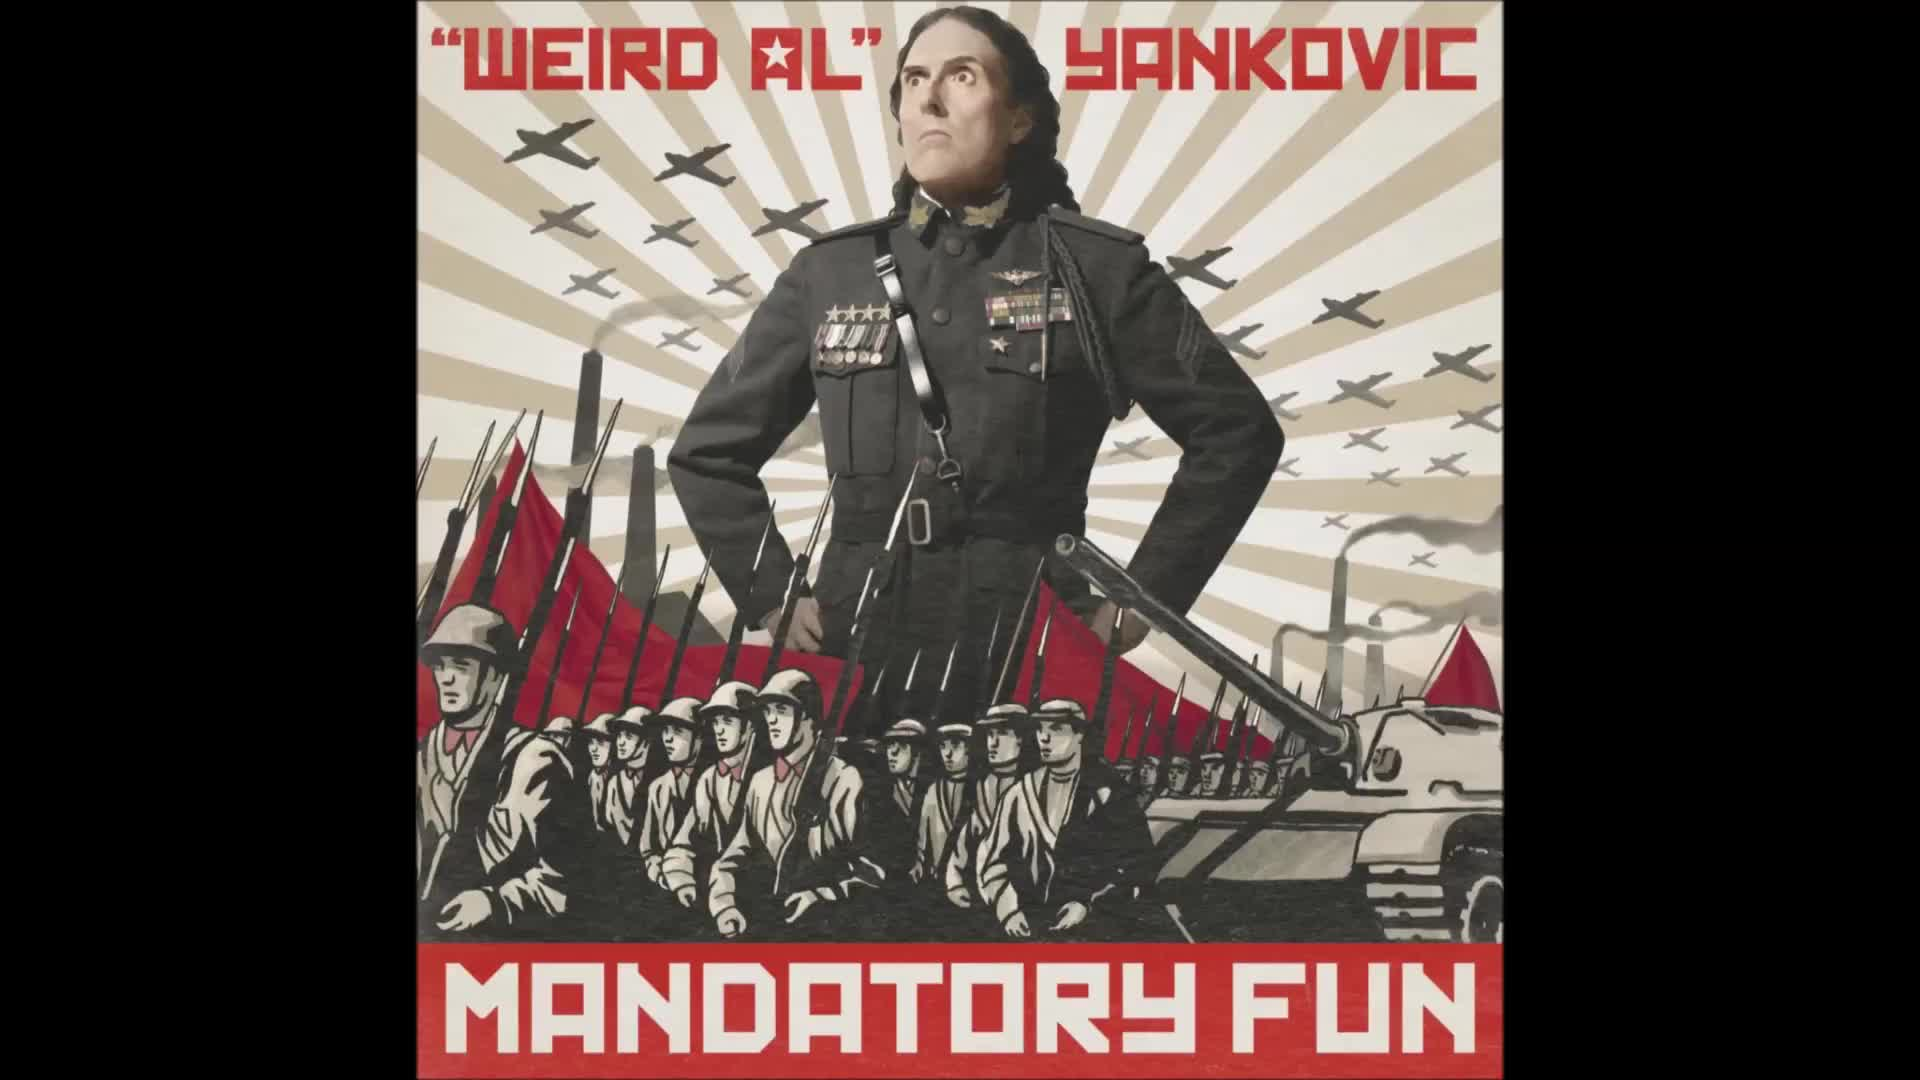 """Weird Al"" Yankovic - Now That's What I Call Polk 2sr48PsVbS0. ""Weird Al Mandatory Fun Track 07 - Now That's What I Call Polka! 2014 Music in this video&qu"